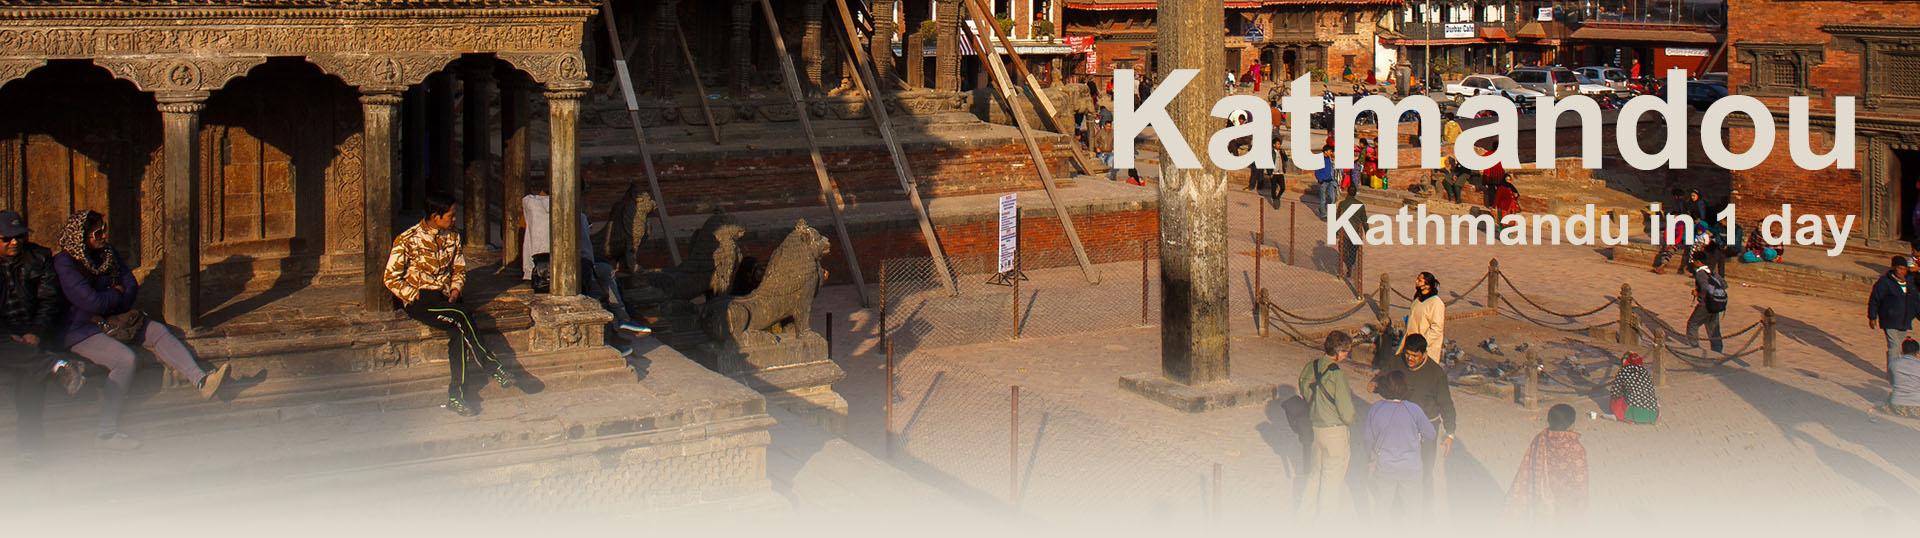 Kathmandou sightseeing tour - guide 1 day Kathmandu